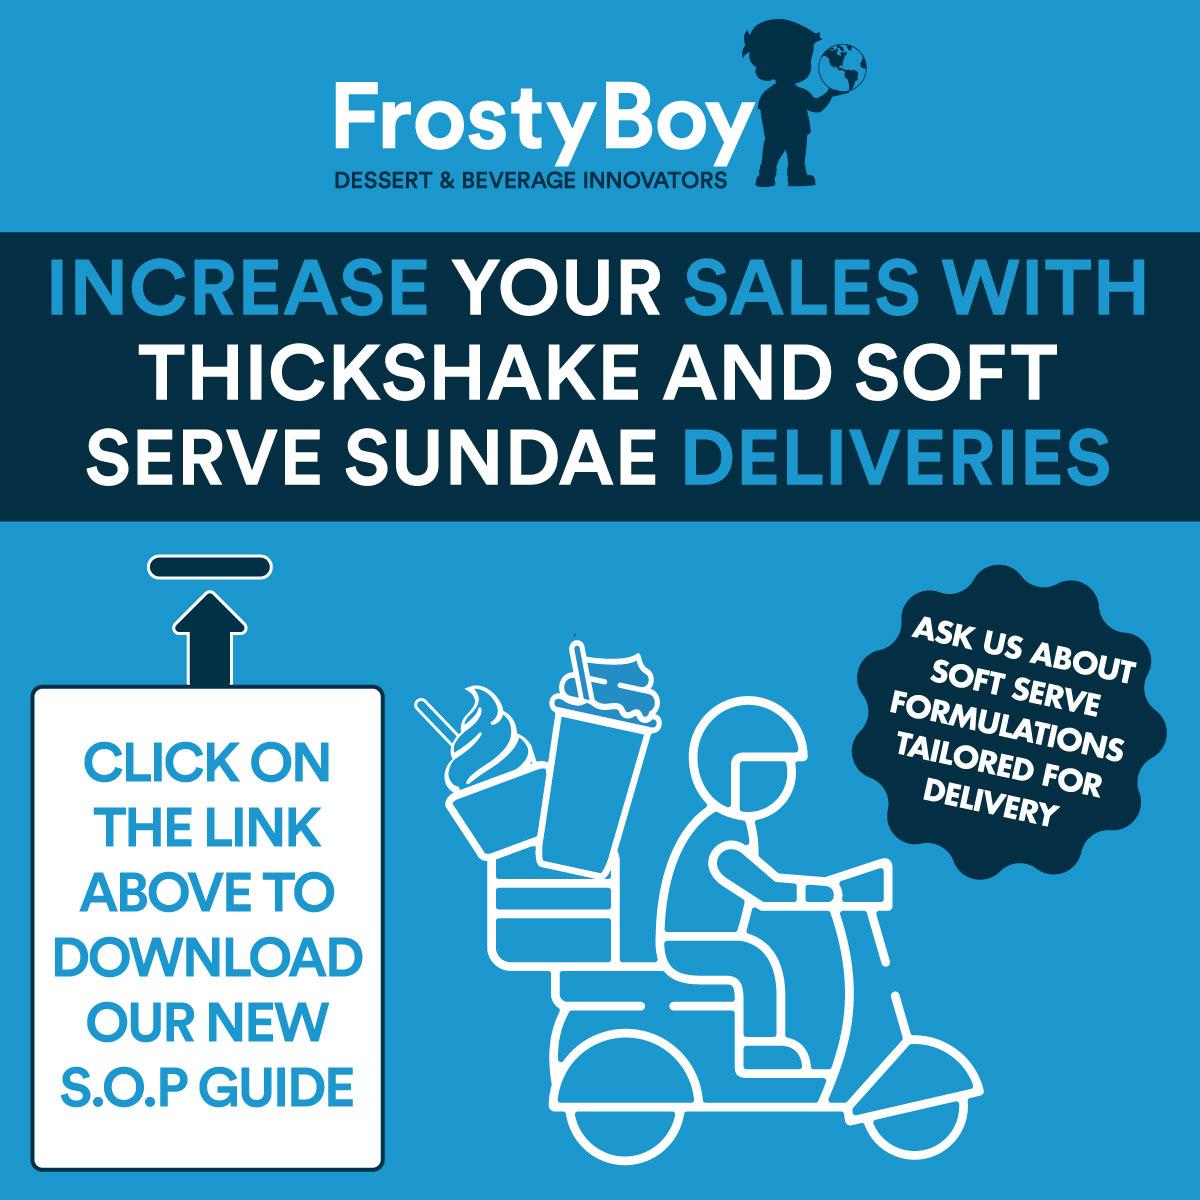 FROSTY-BOY-THICKSHAKE-AND-SOFT-SERVE-DELIVERY-IMAGE